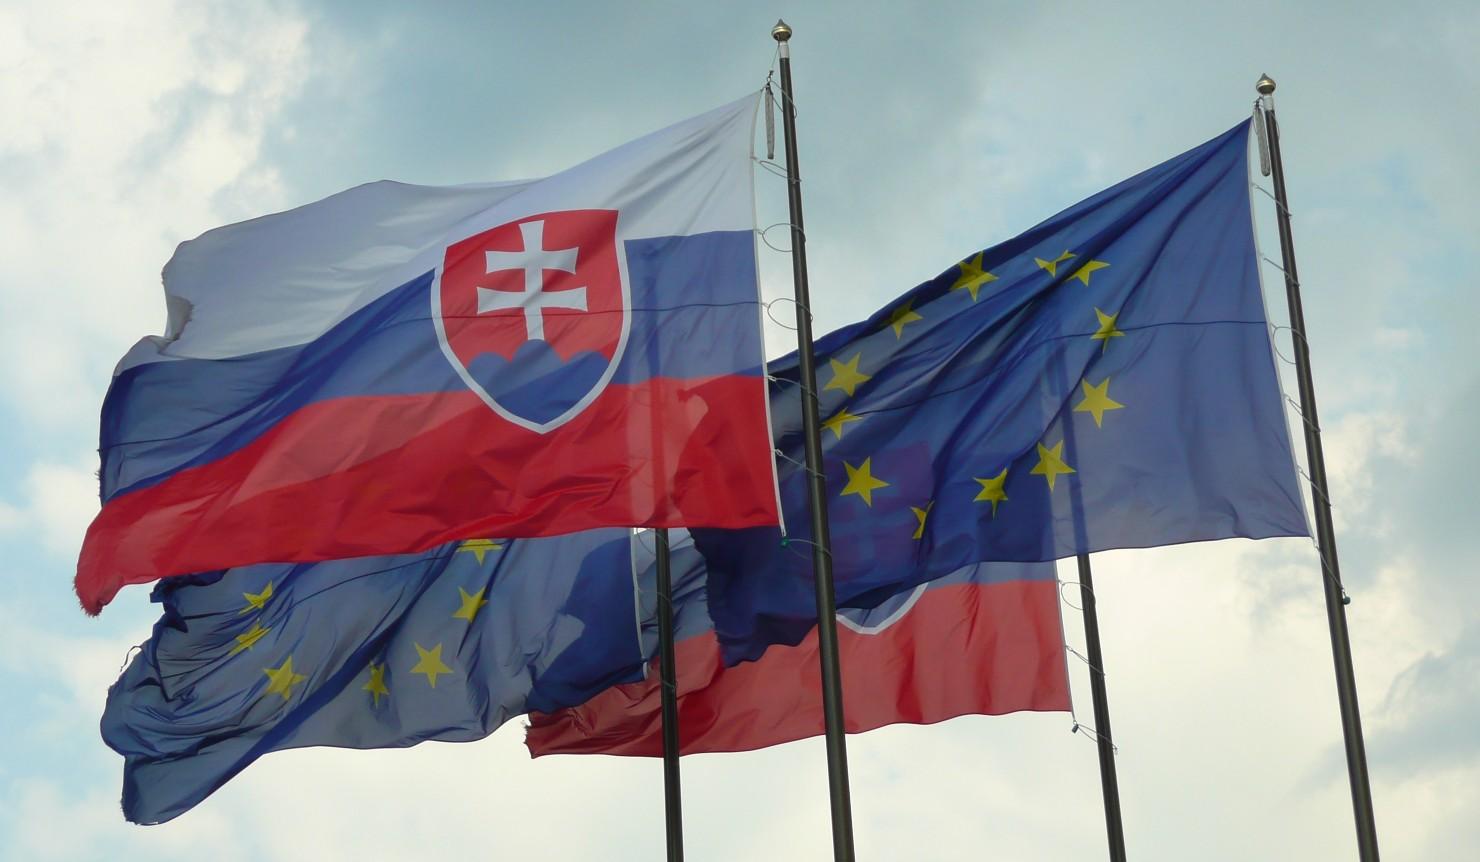 c592feb978 Slovakia wants while presiding the EU to strengthen the Union s borders and  avoid fragmentation